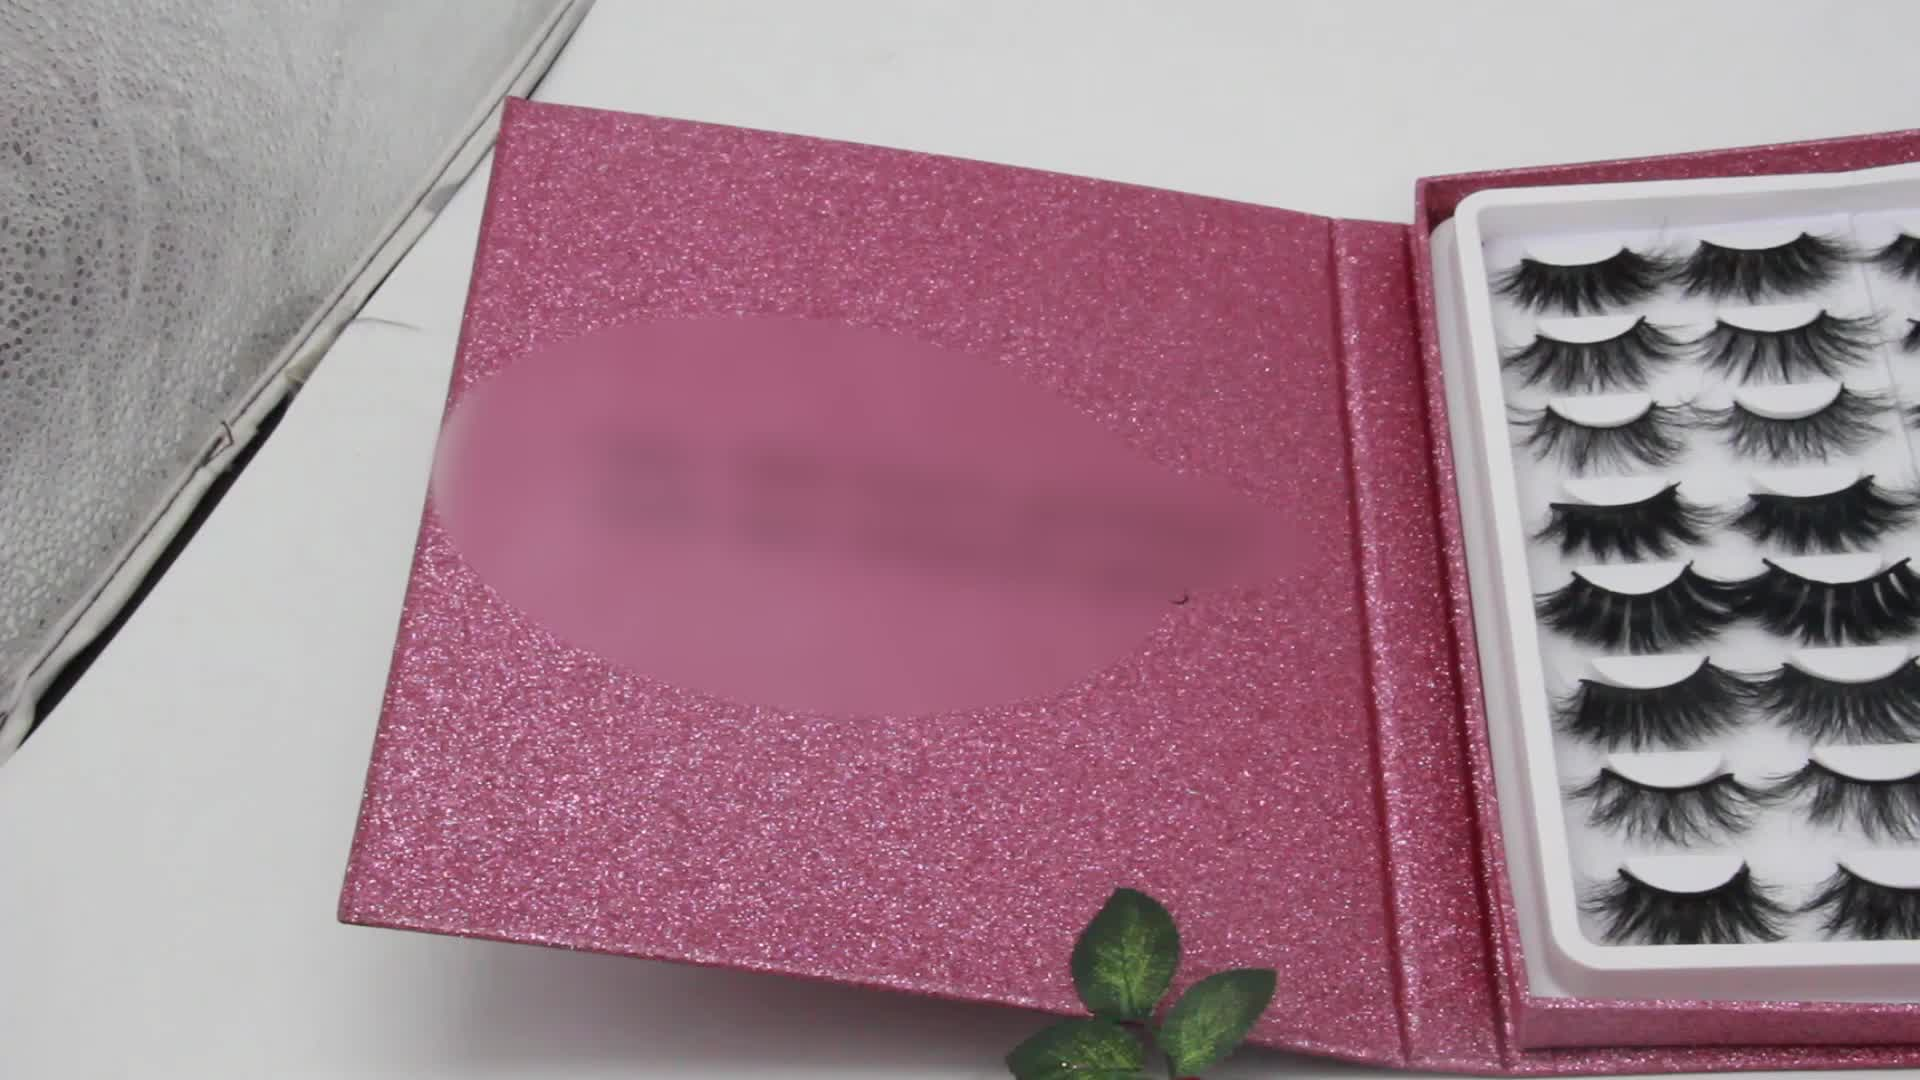 Private Label 3D норки ресниц книга Ложные ресниц книга Пользовательские вышивка крестом пакет ресниц книга с ресницами